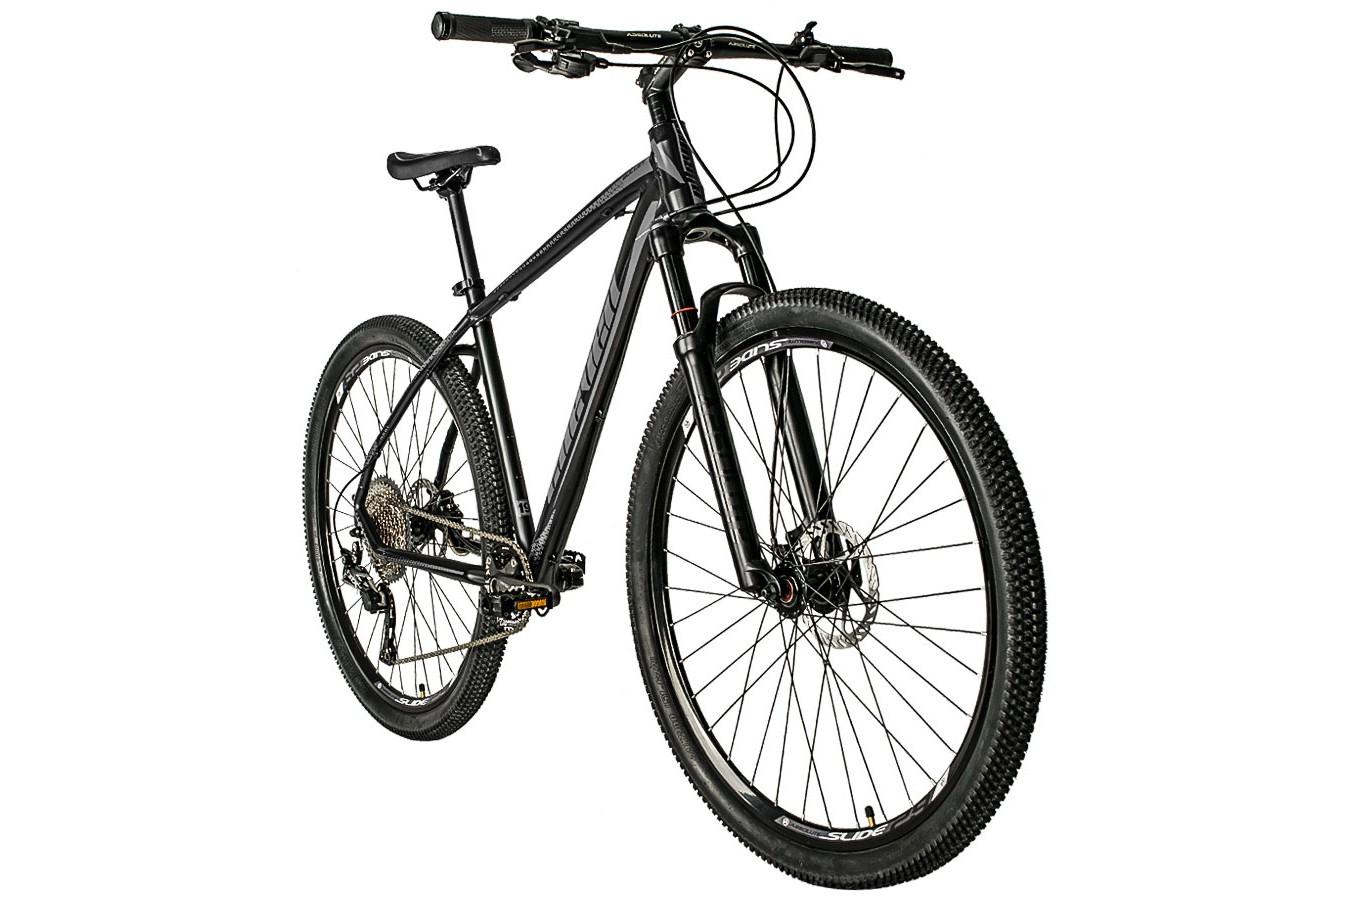 Bicicleta 29 MTB Bullet SLX 11V Freio Hidráulico Suspensão Ar - Elleven